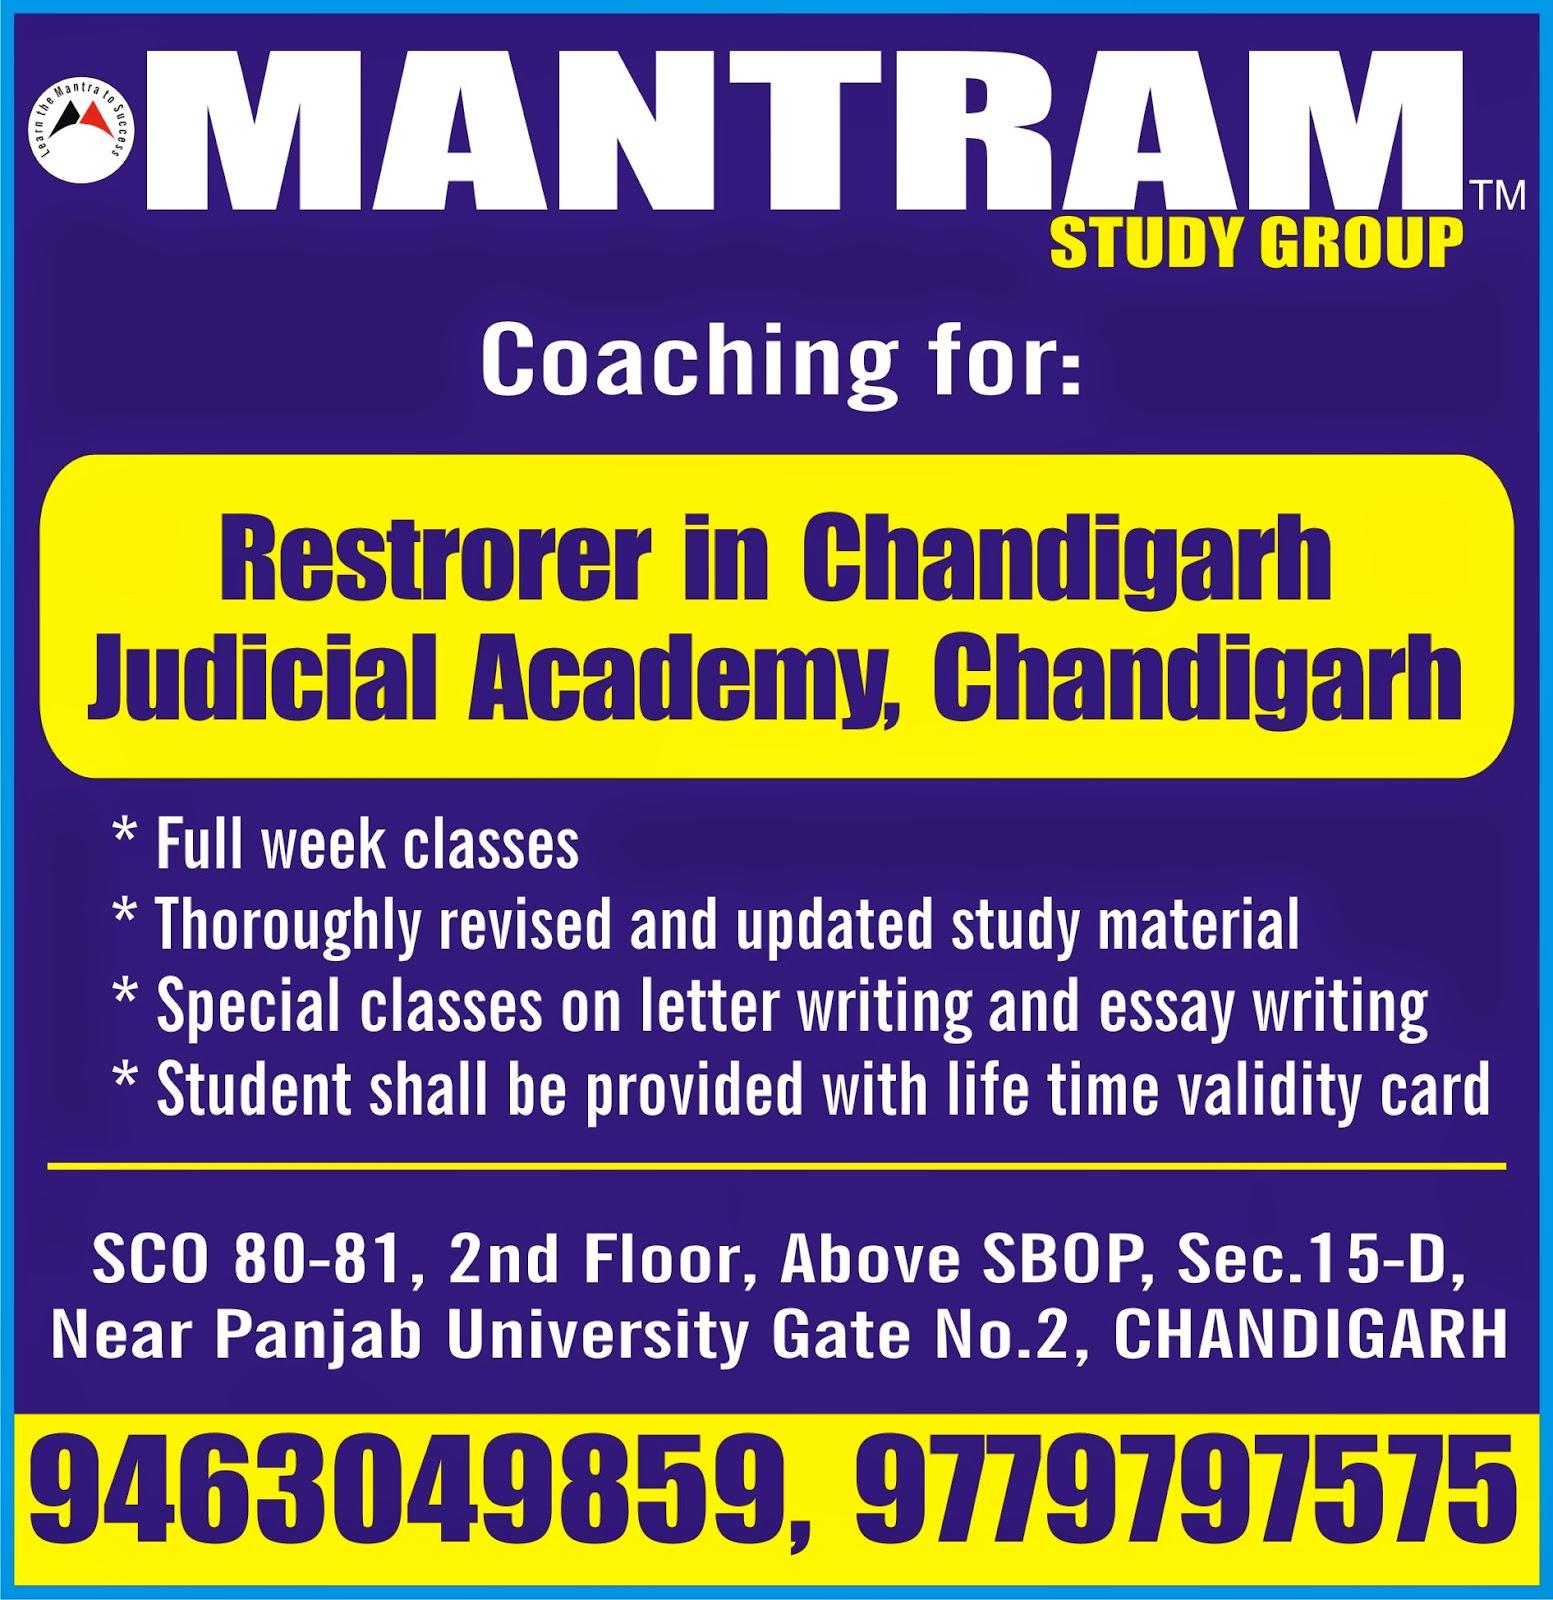 mantram study group latest govt jobs in 2017 expertise coaching for restorer chandigarh judicial academy sector 43 chandigarh by mantram study group in chandigarh